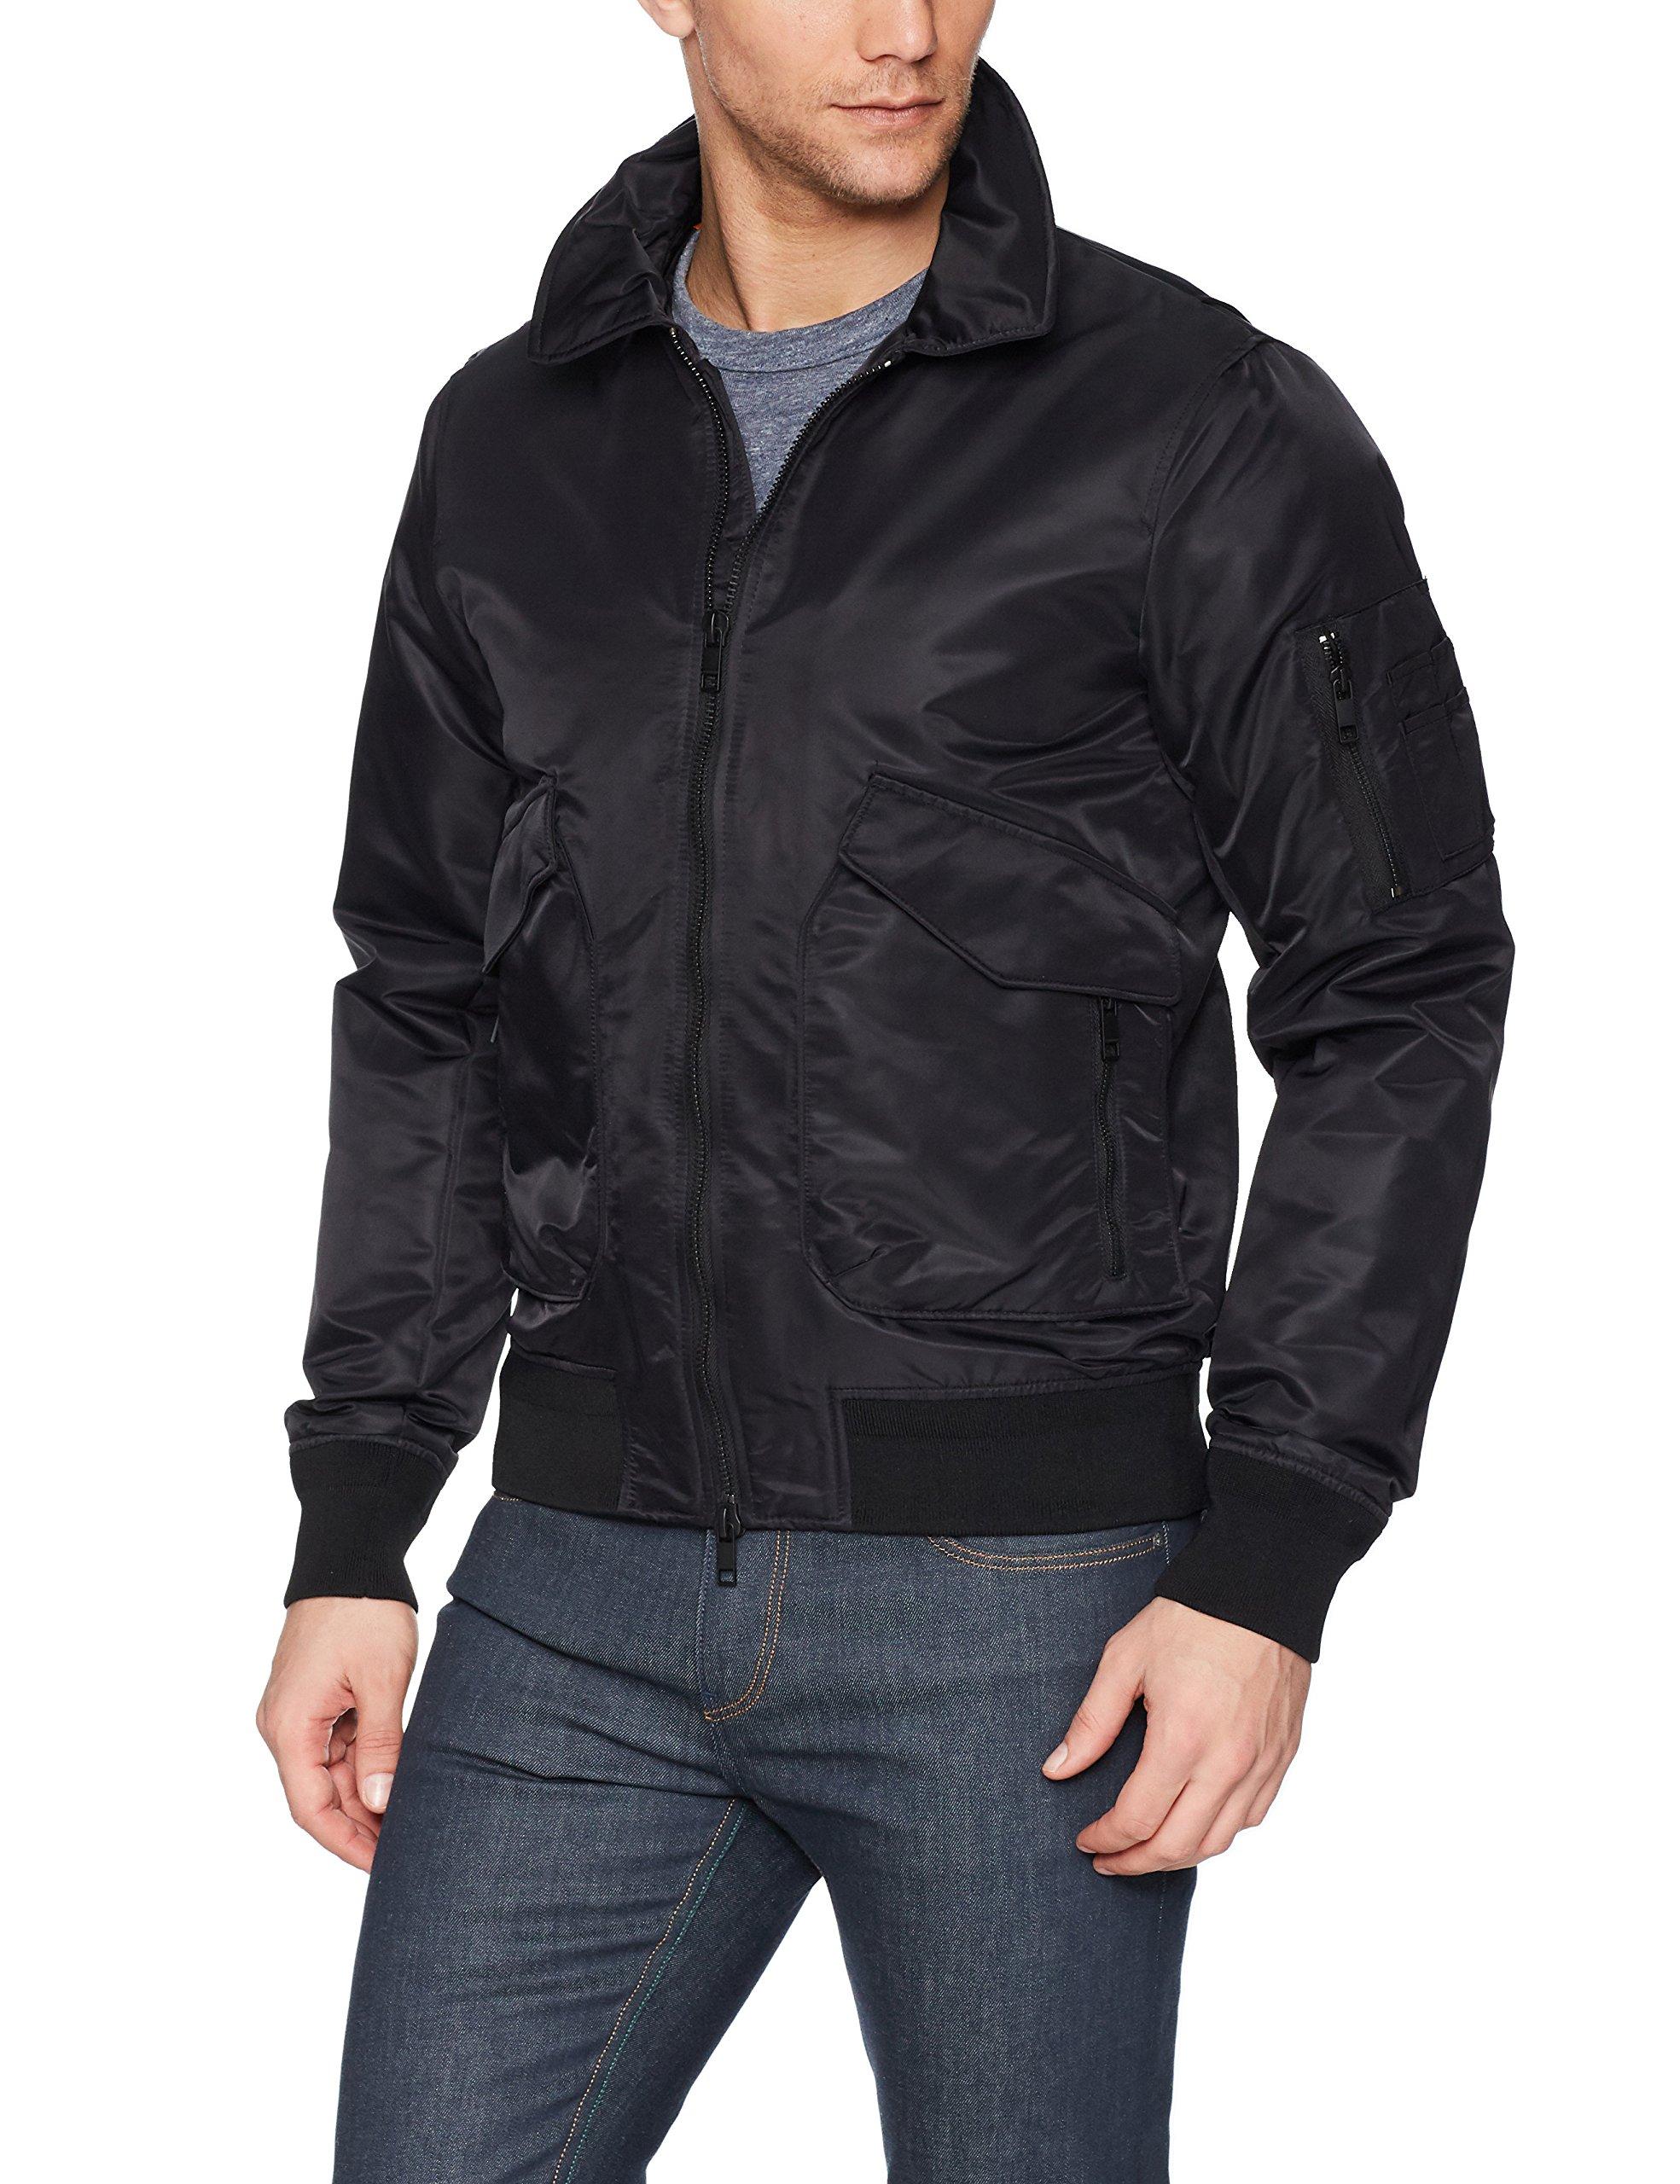 J.Lindeberg Men's Nylon Flight Jacket, Black, Large